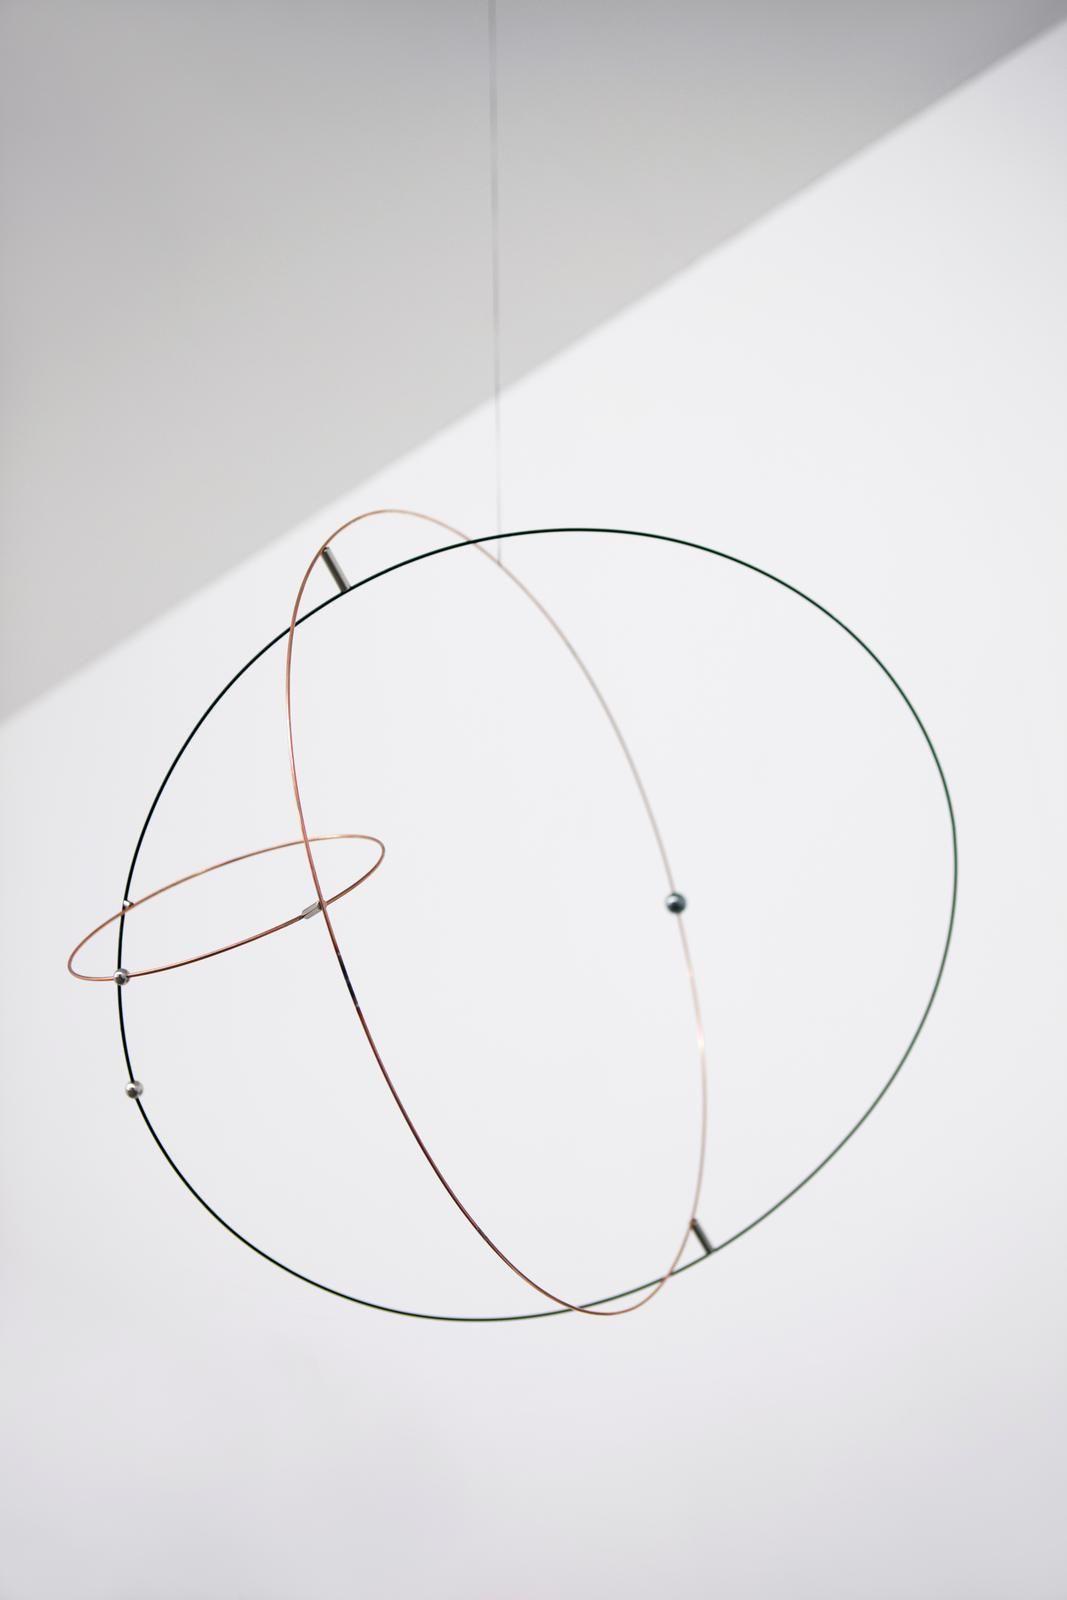 Multiverse 4 • Artwork • Studio Olafur Eliasson • The compasses ...